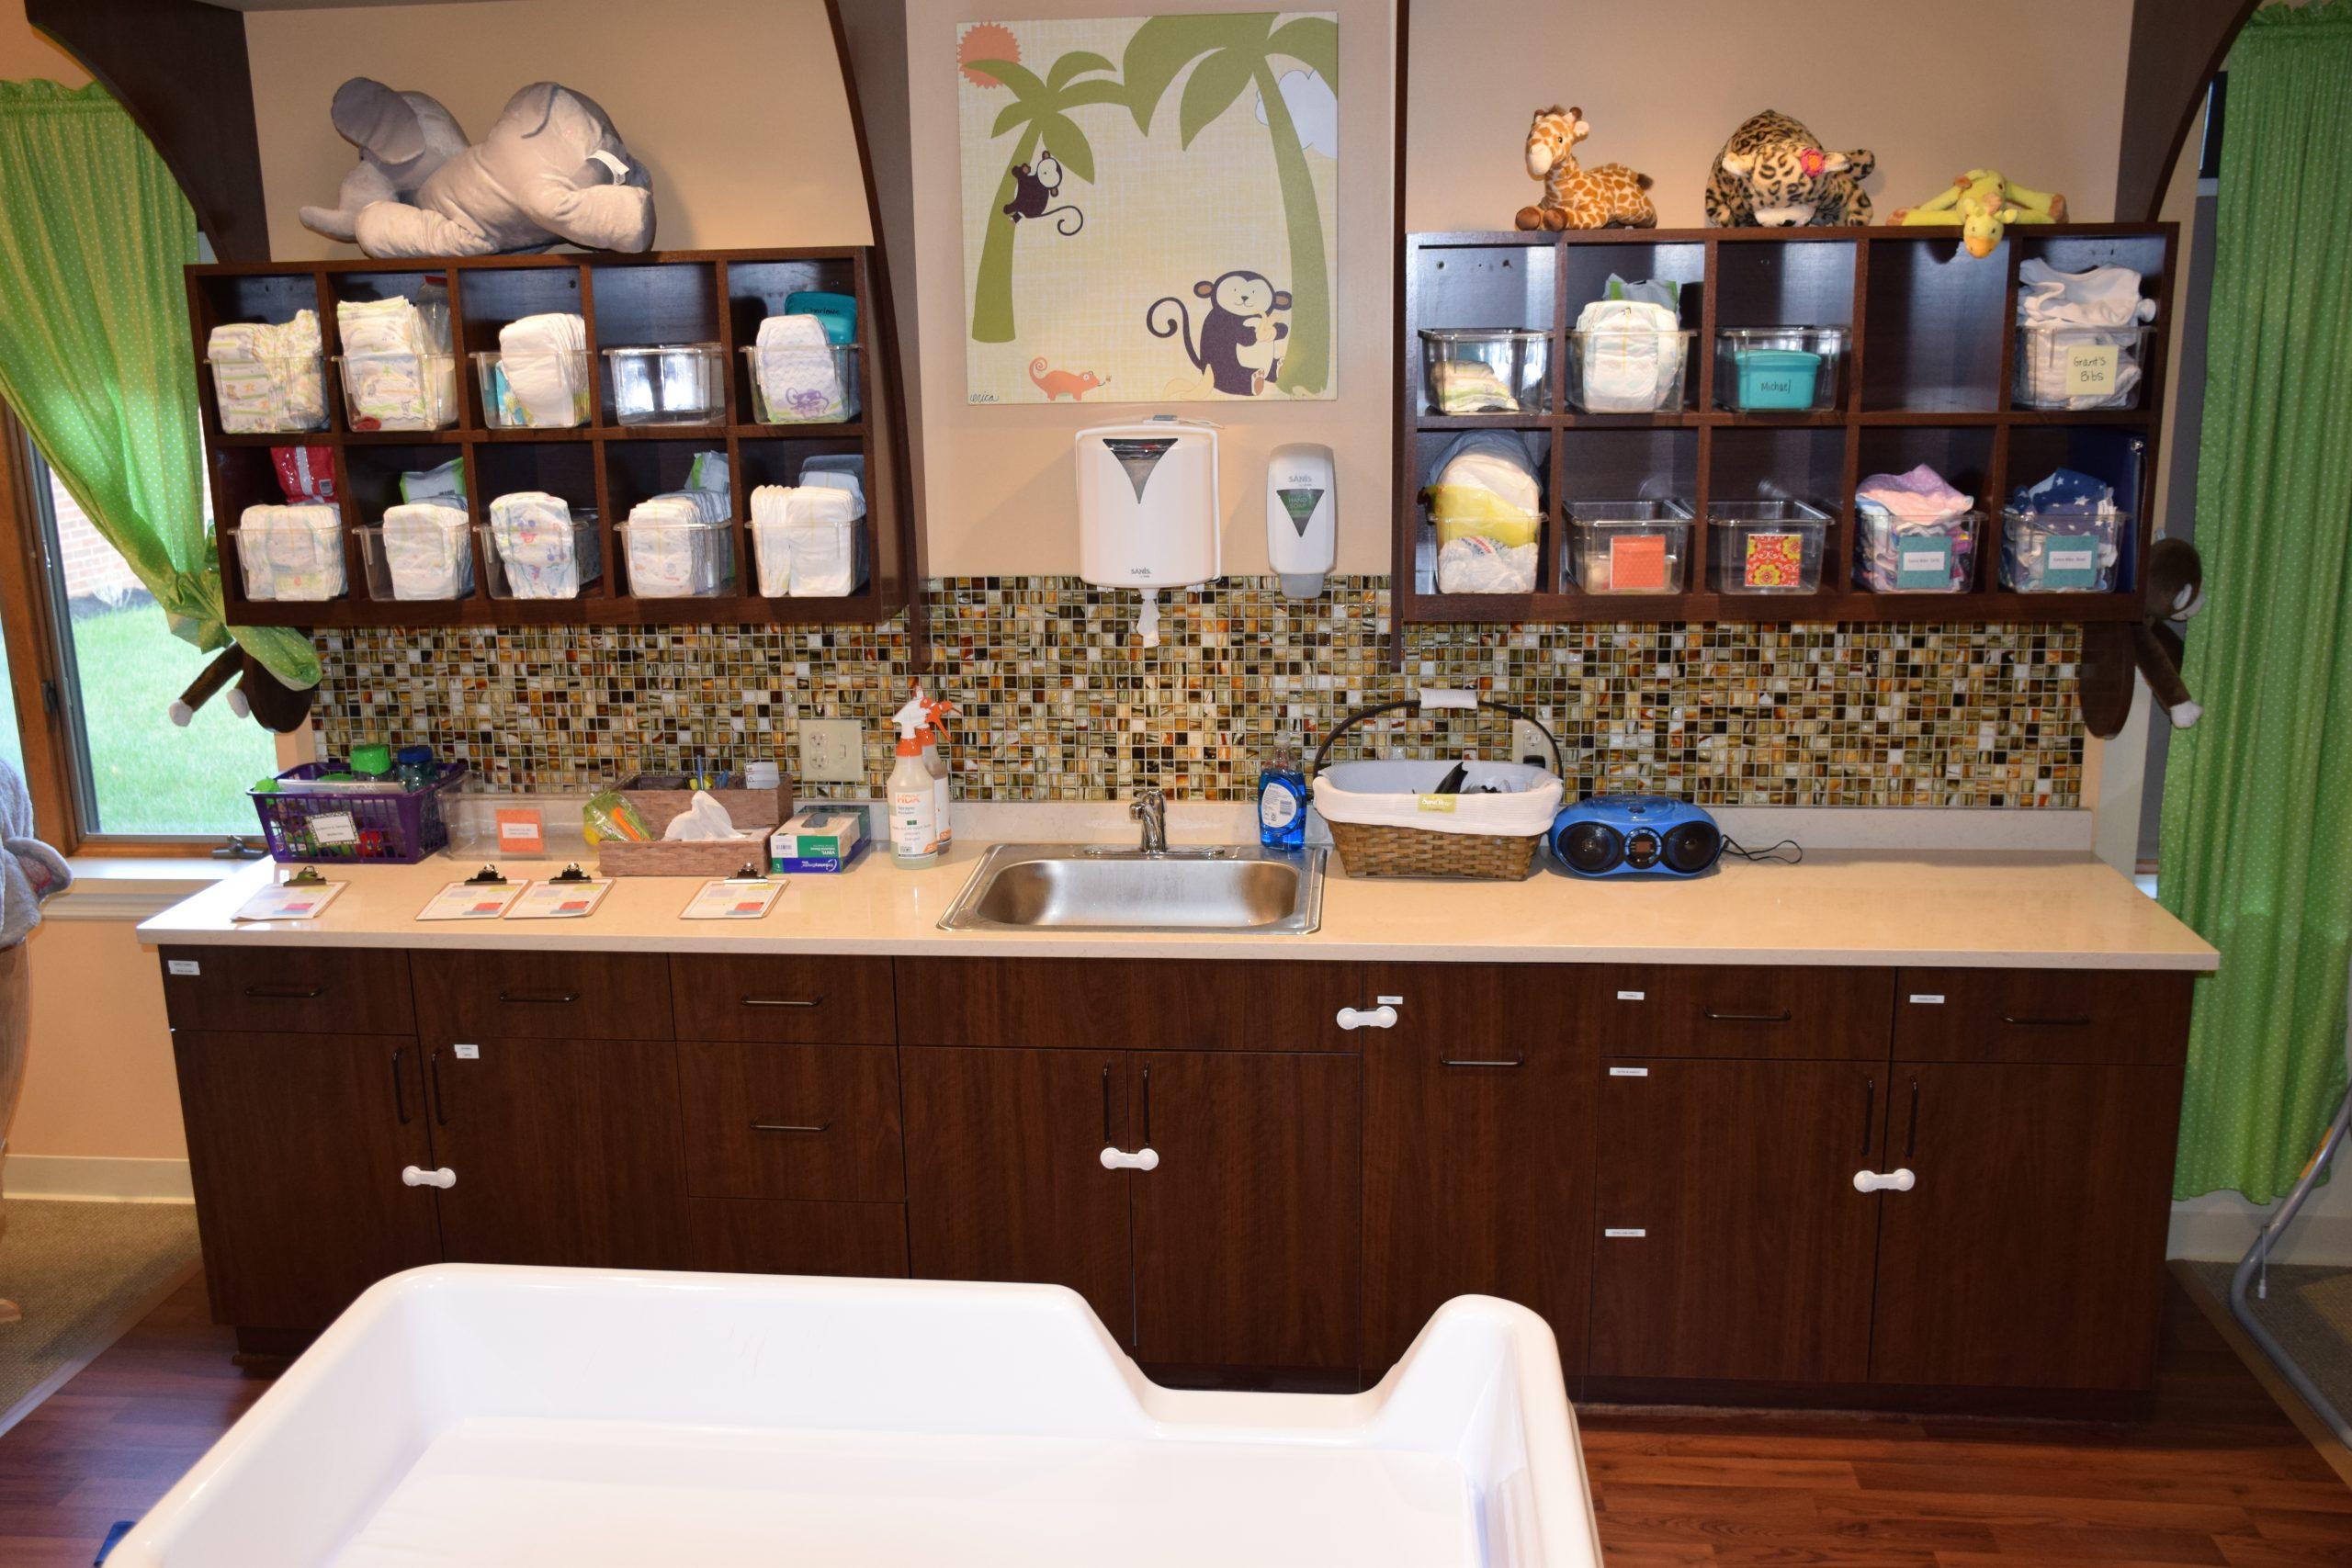 Pediatric room's wash, diaper, and storage area